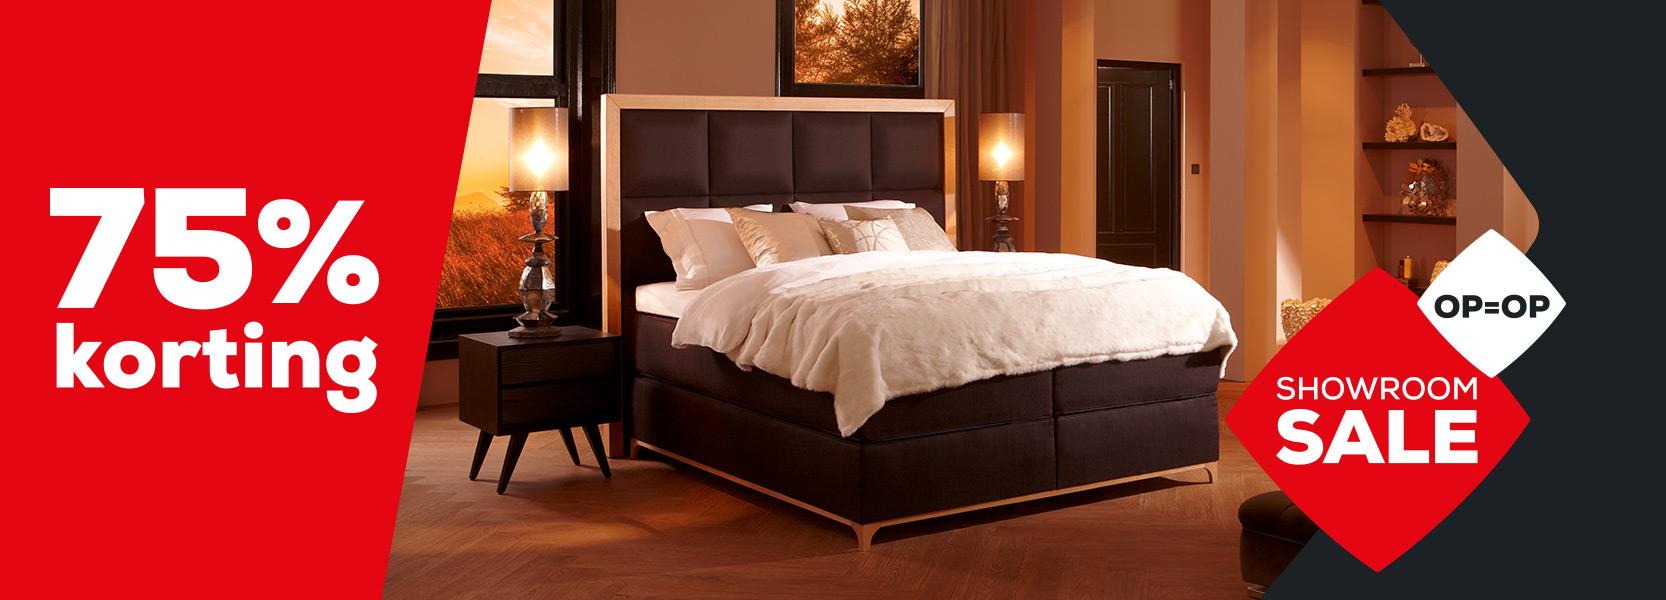 Diks Bedmakers Showroom Sale   Swiss Sense